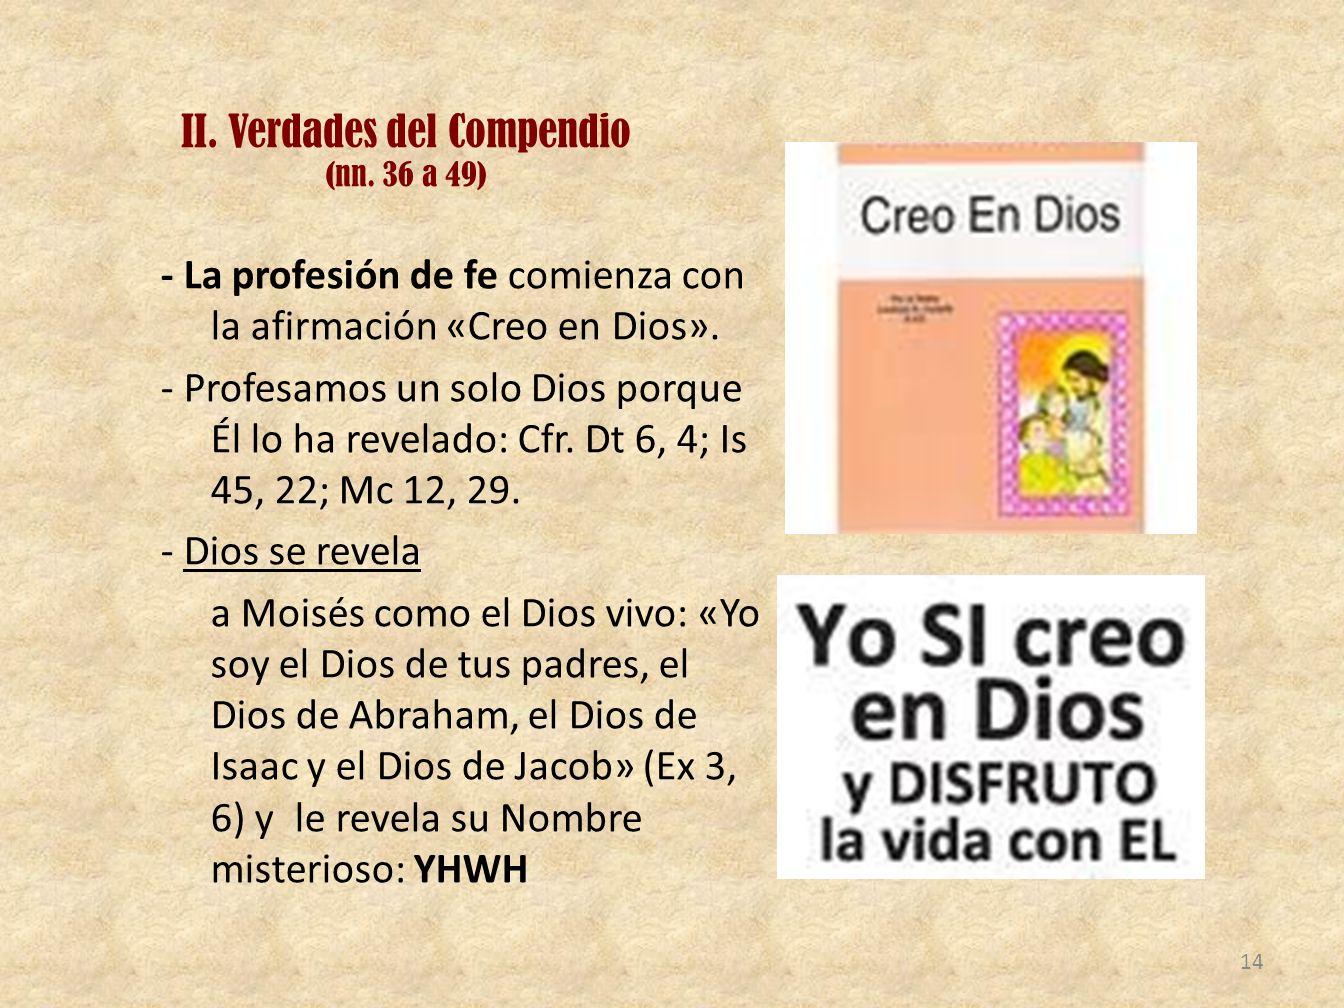 II. Verdades del Compendio (nn. 36 a 49)